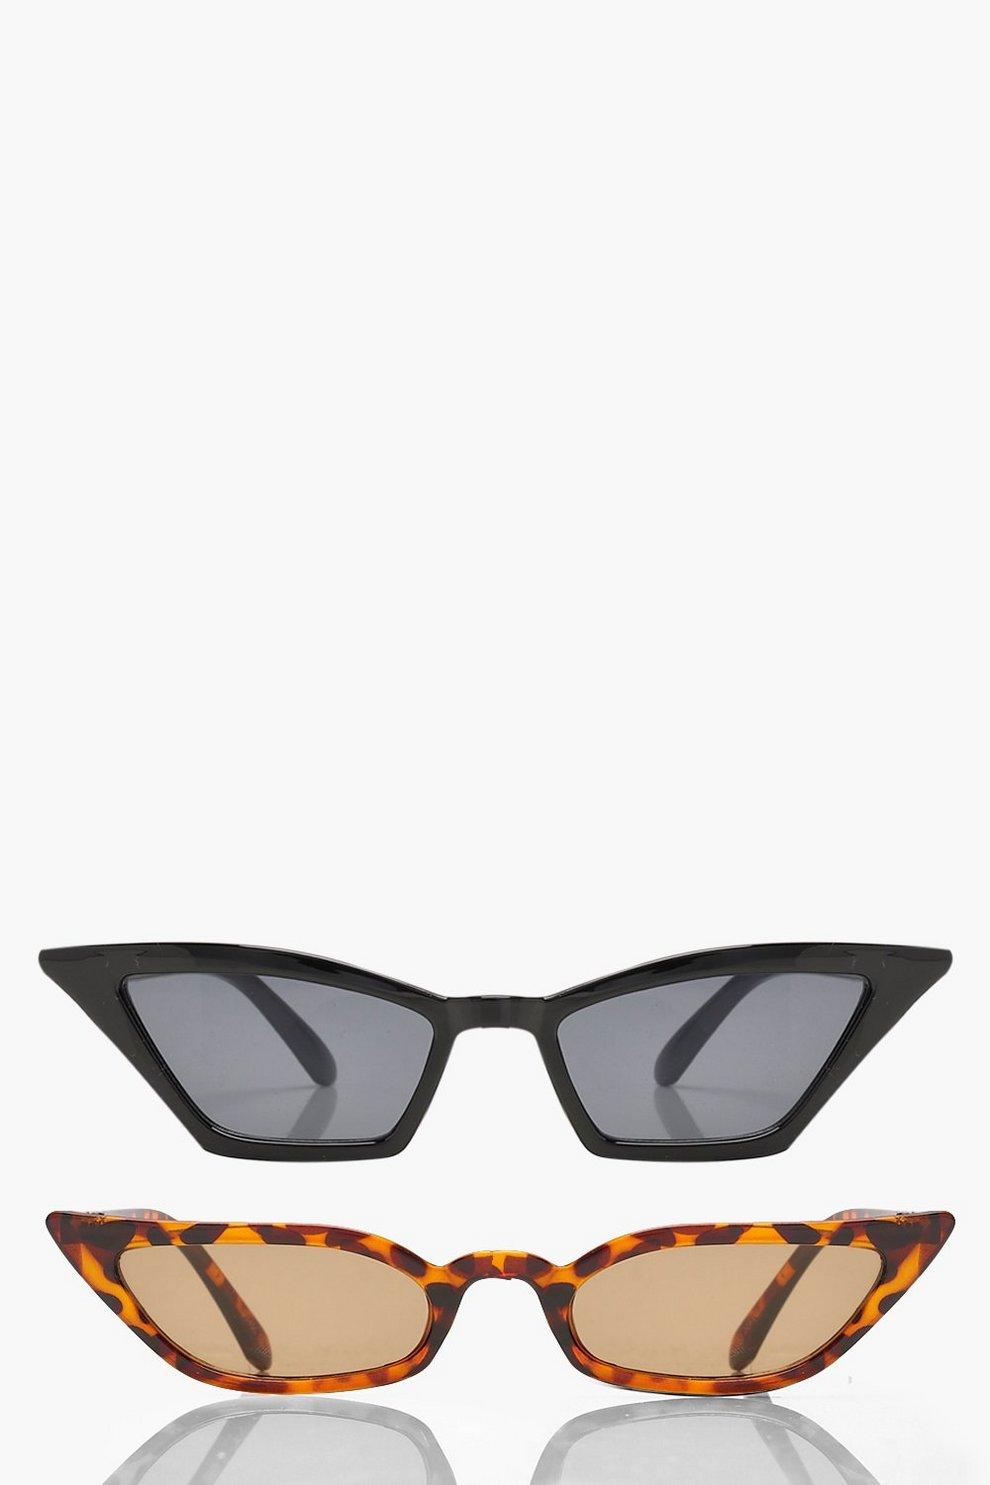 2a2d6c0ae7a 2 Pack Skinny Winged Cat Eye Sunglasses